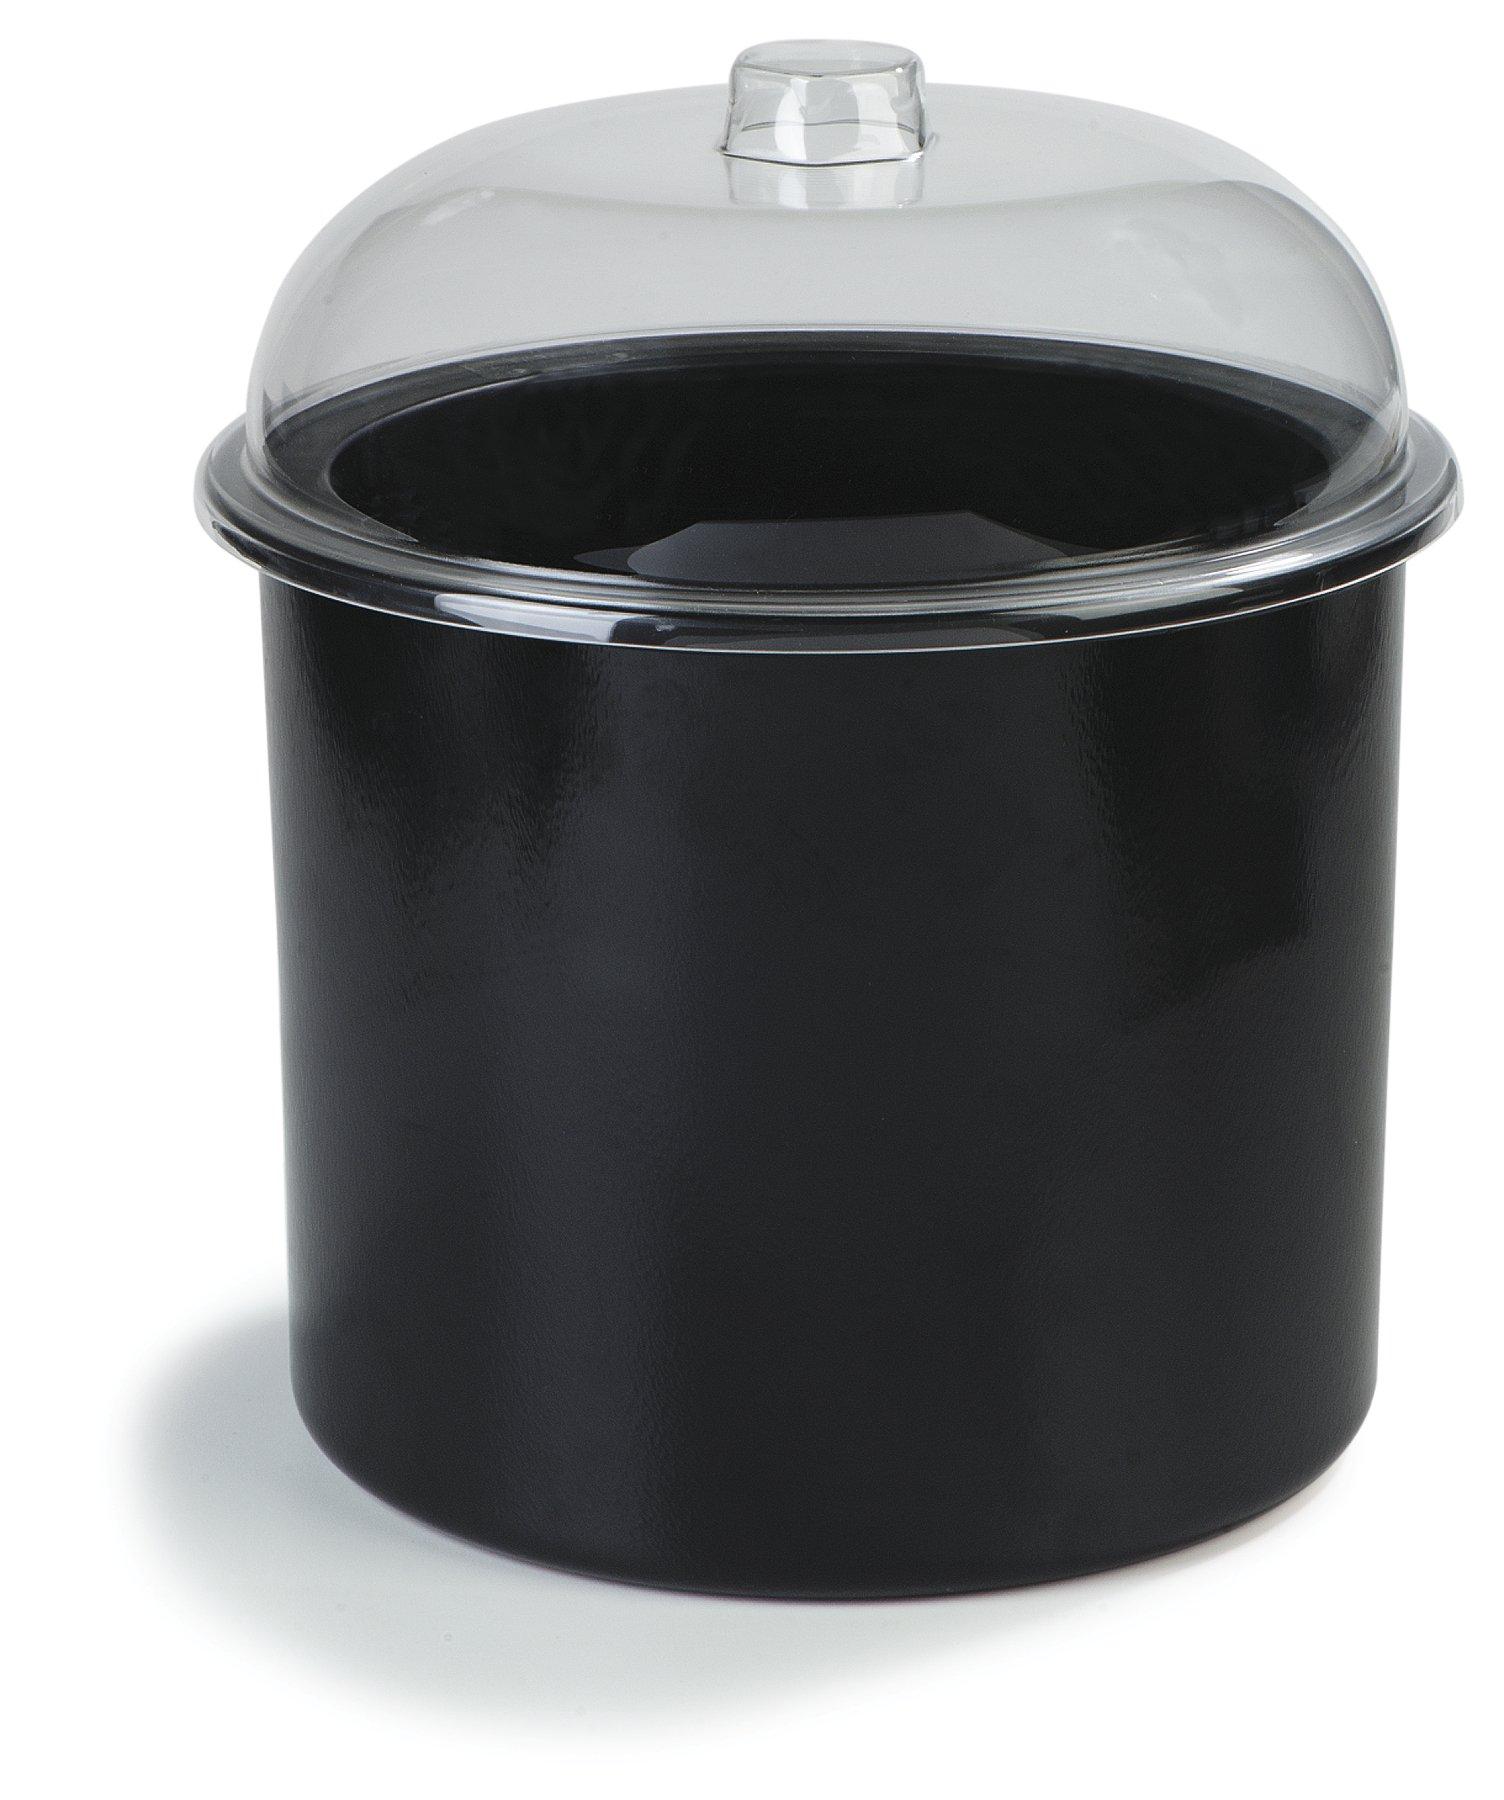 Carlisle CM101203 Coldmaster Insulated Ice Cream Server with Lid, 3 Gallon Capacity, Black